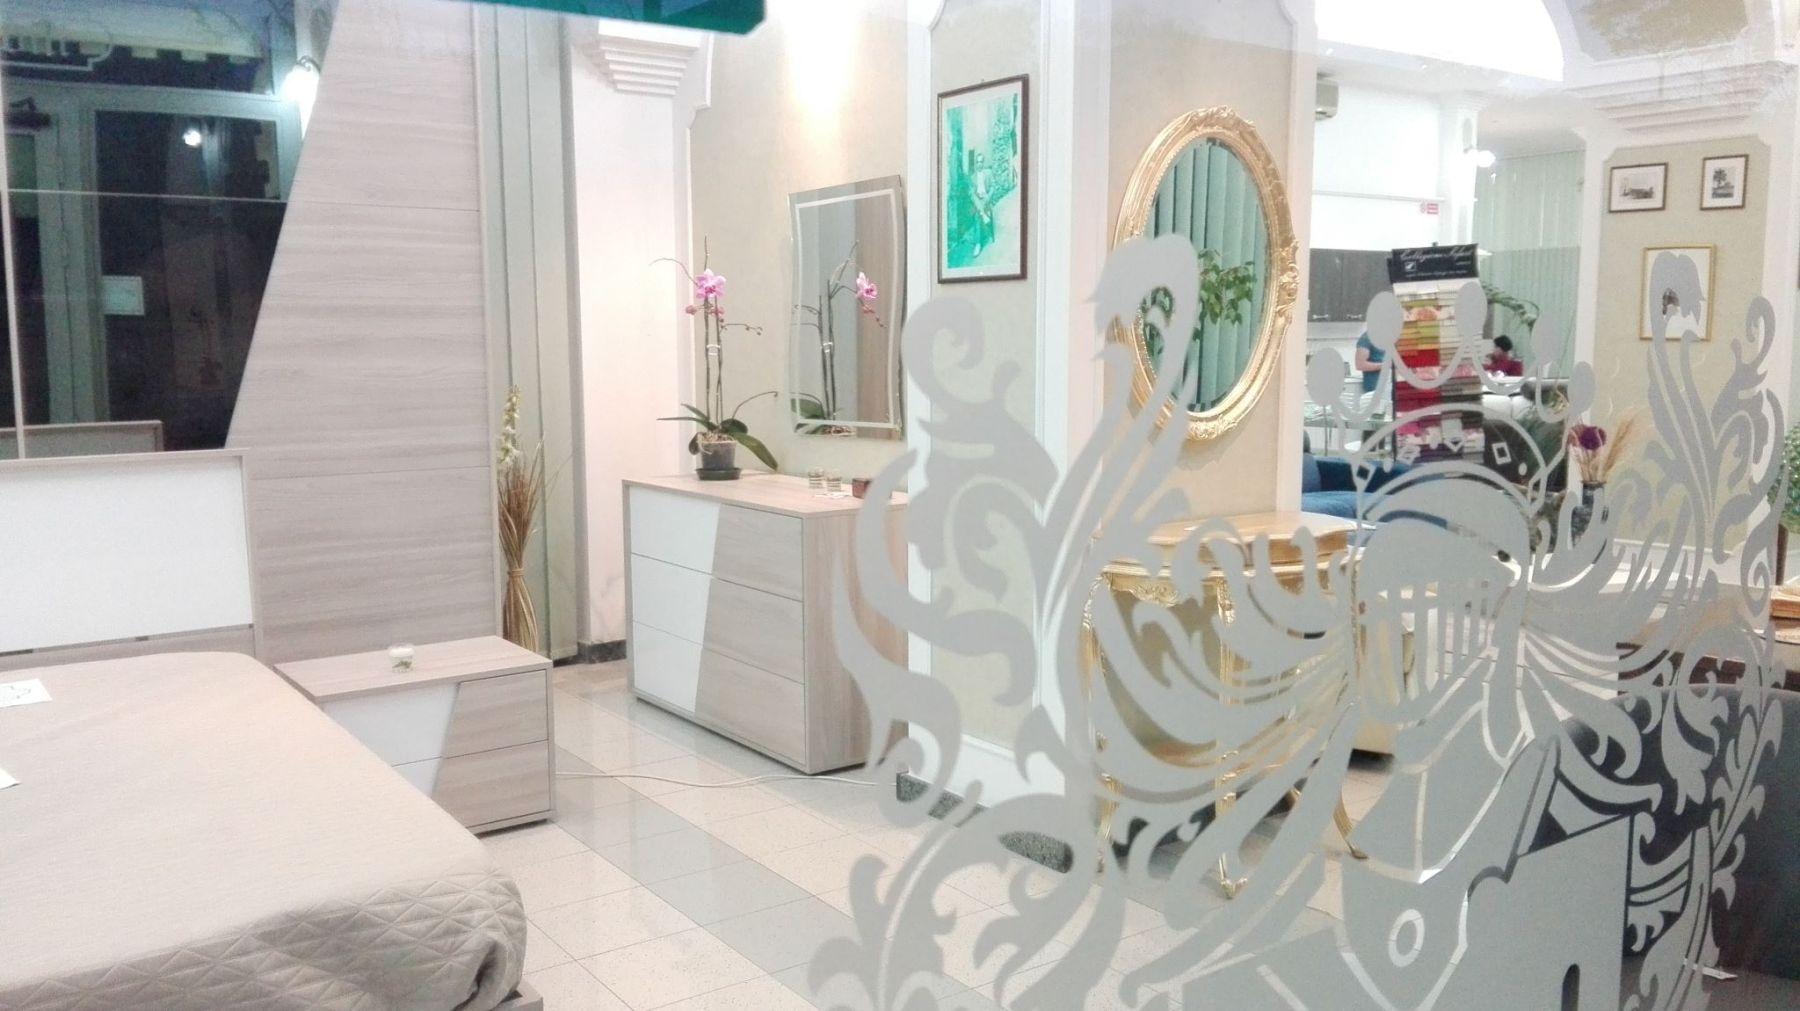 Negozi Di Mobili Catania arte mobili arreda | interior design | caltagirone | mobili